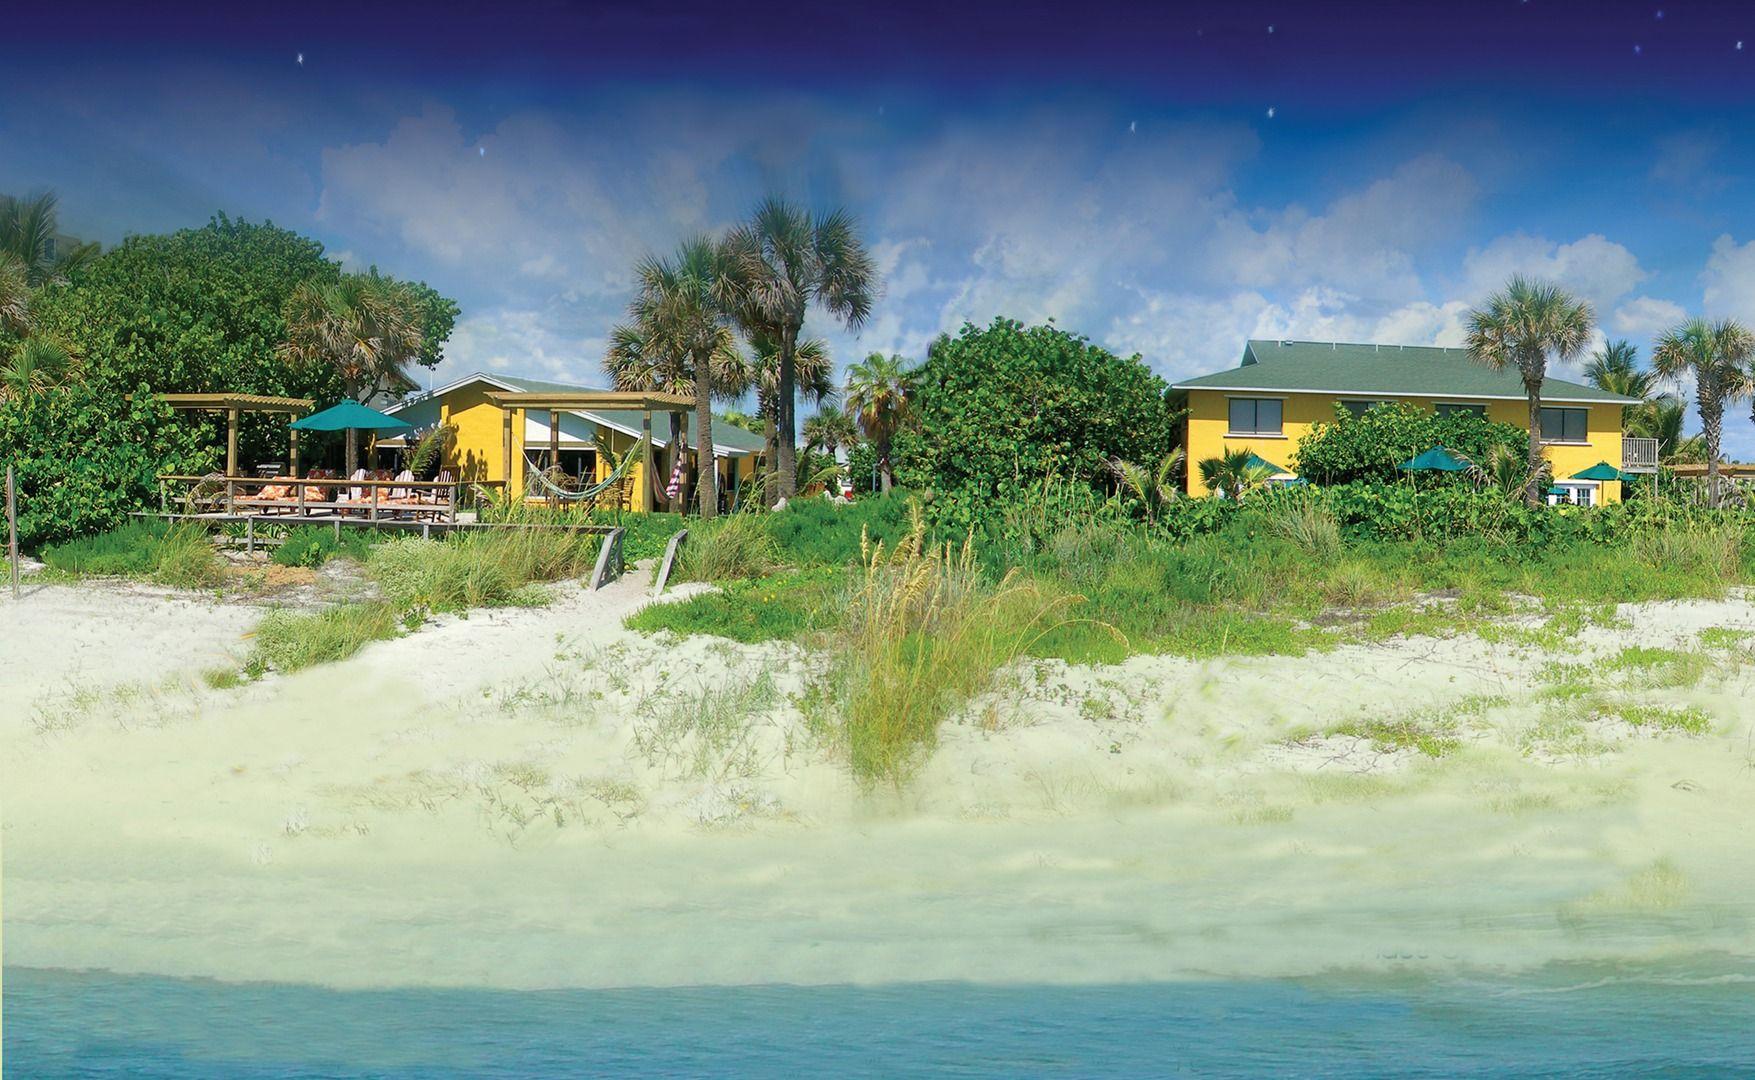 Home Beach Place Guesthouses on Cocoa Beach near Surf